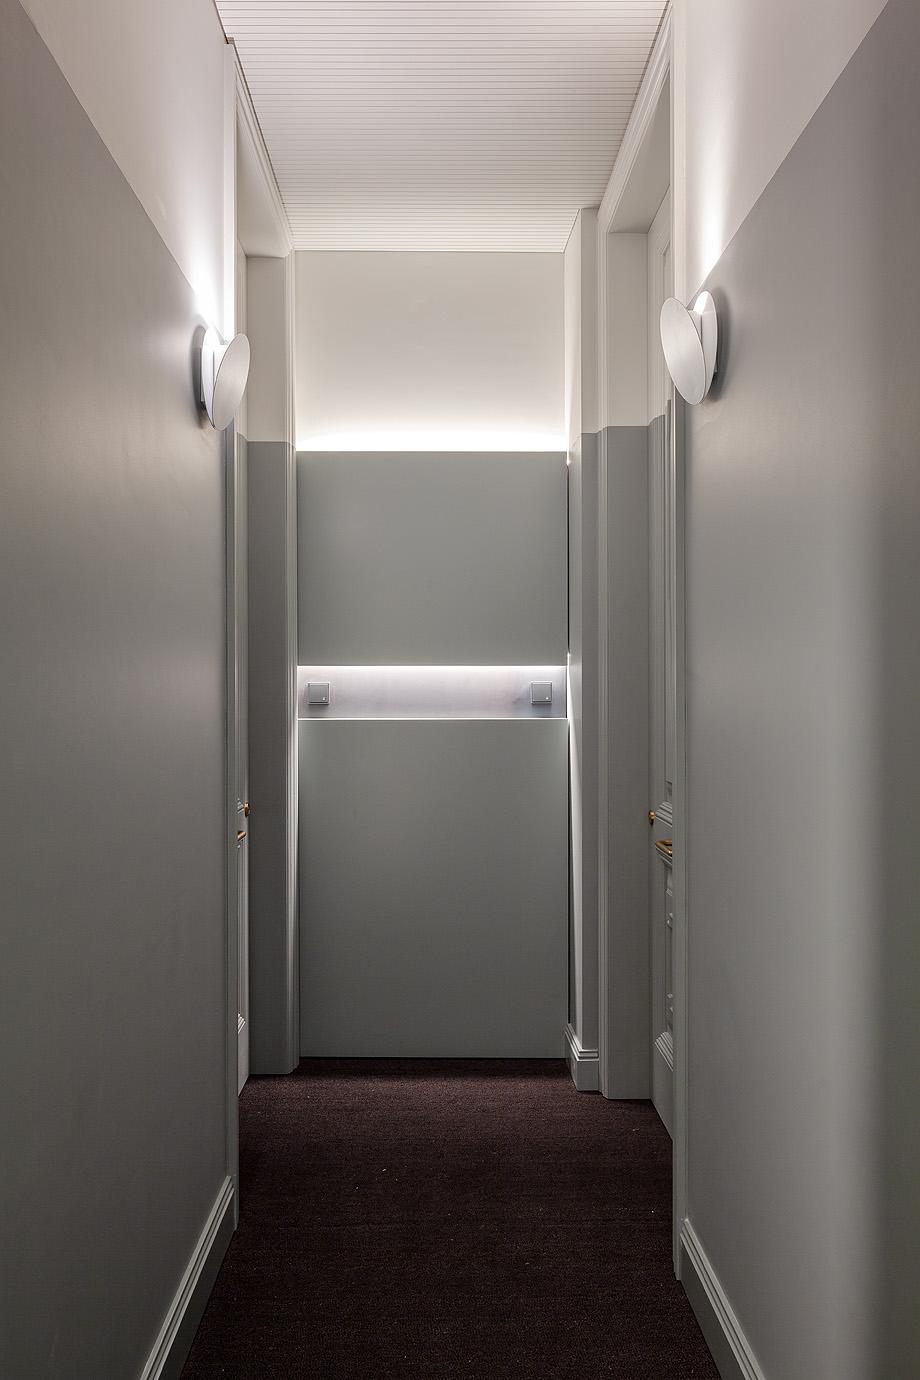 dos apartamentos en girona por maite prats - foto marc torra (2)